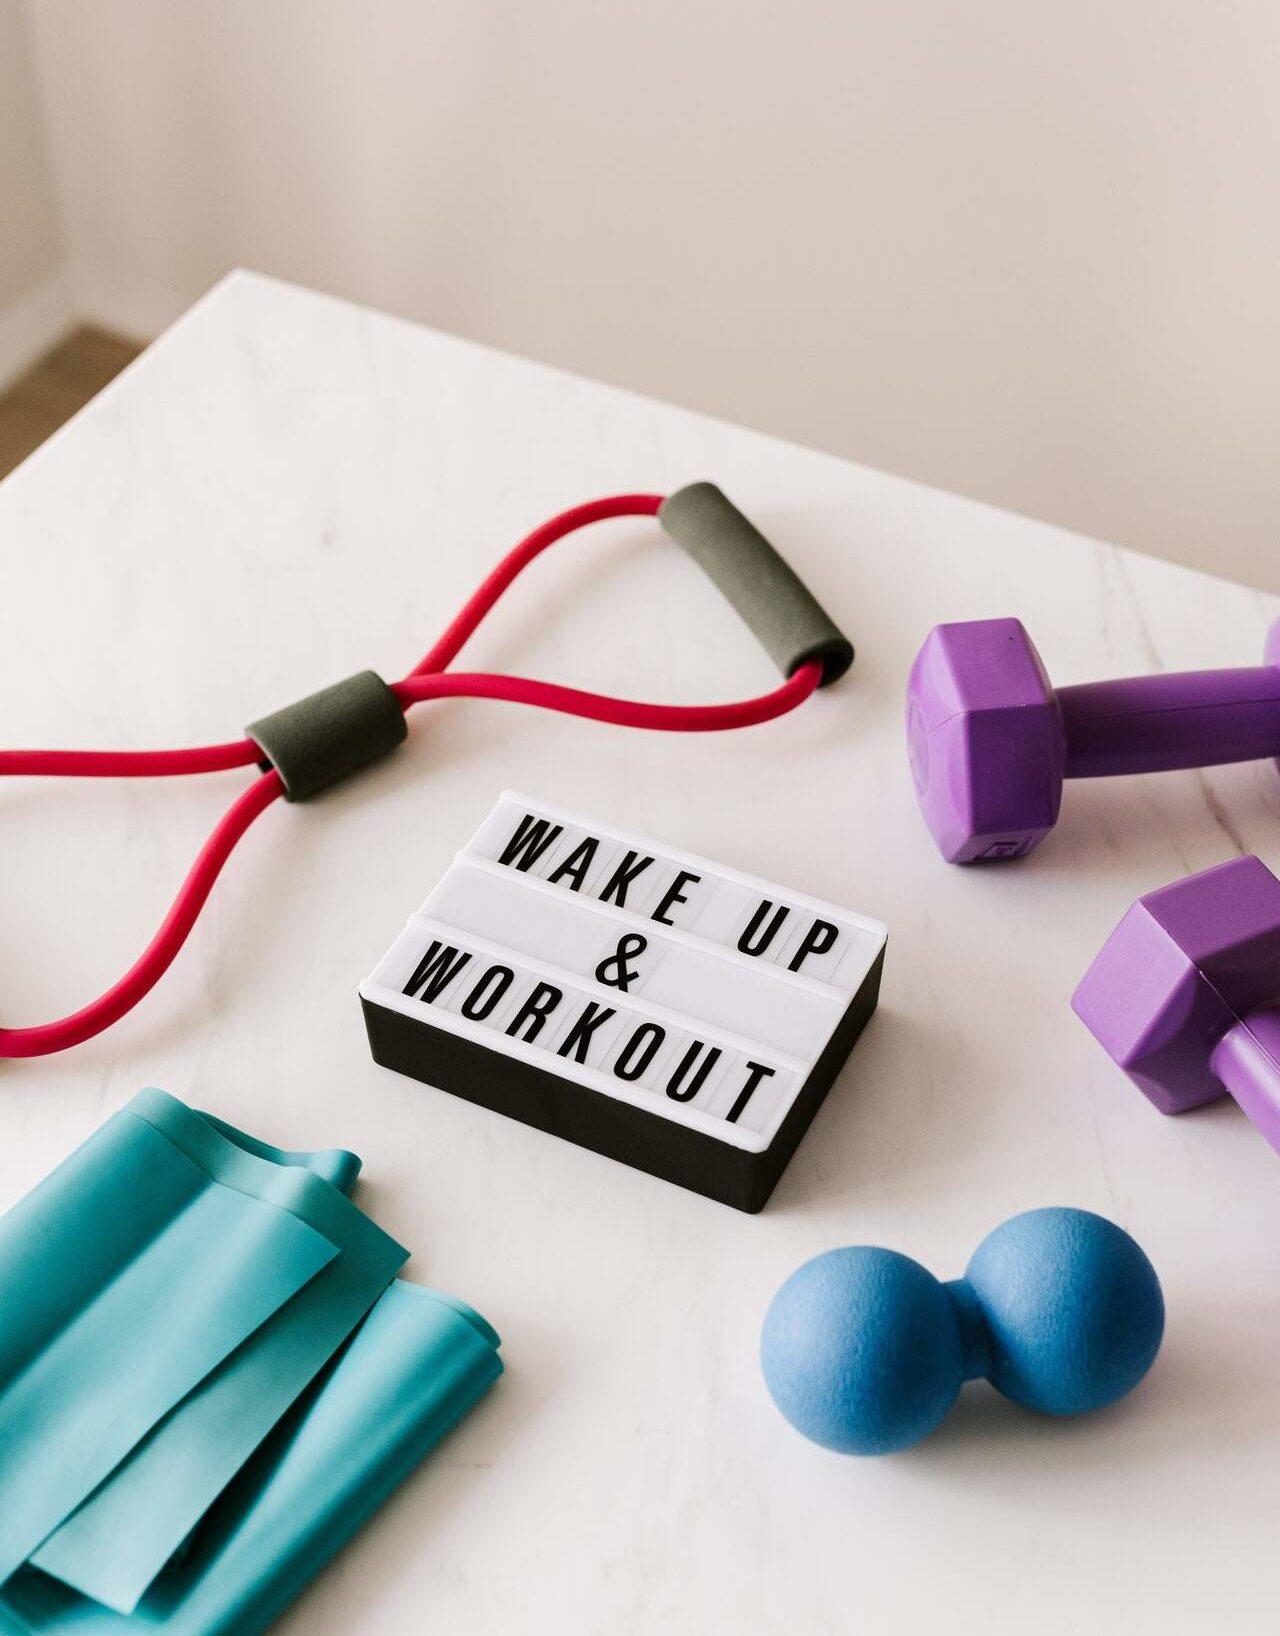 Maintaining motivation